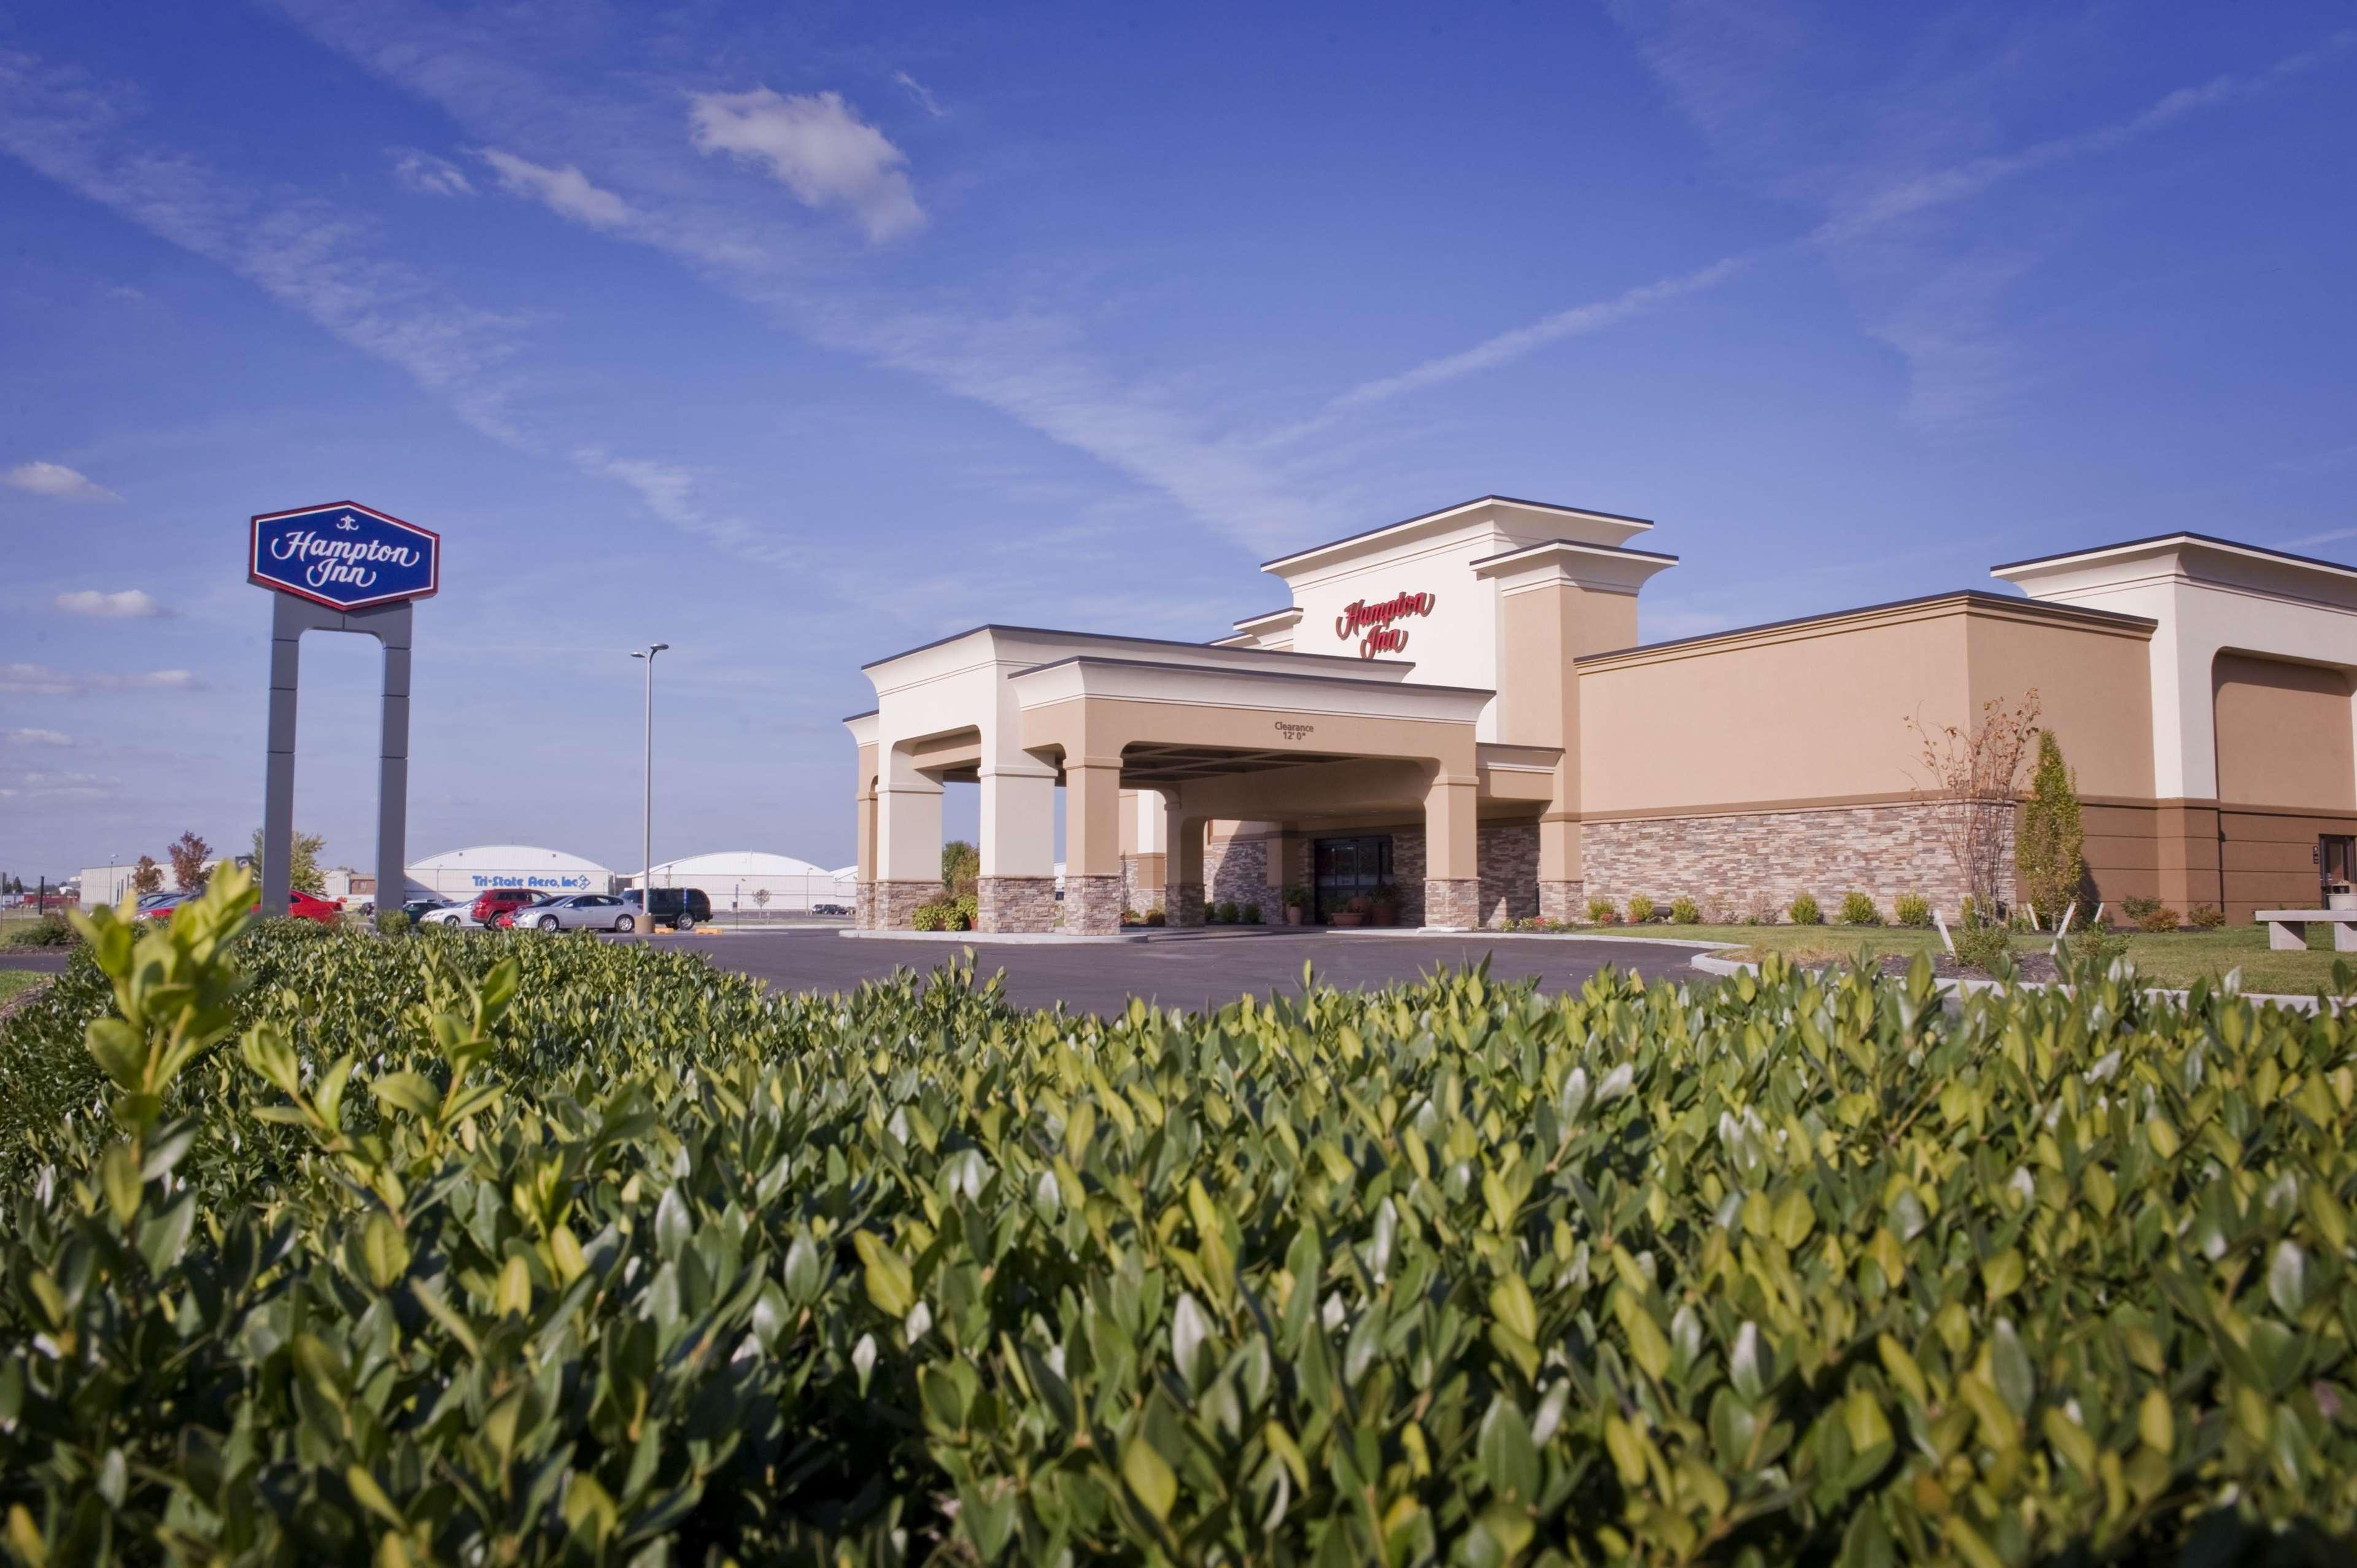 Hampton Inn Evansville/Airport - Evansville, IN 47711 - (812)464-1010 | ShowMeLocal.com